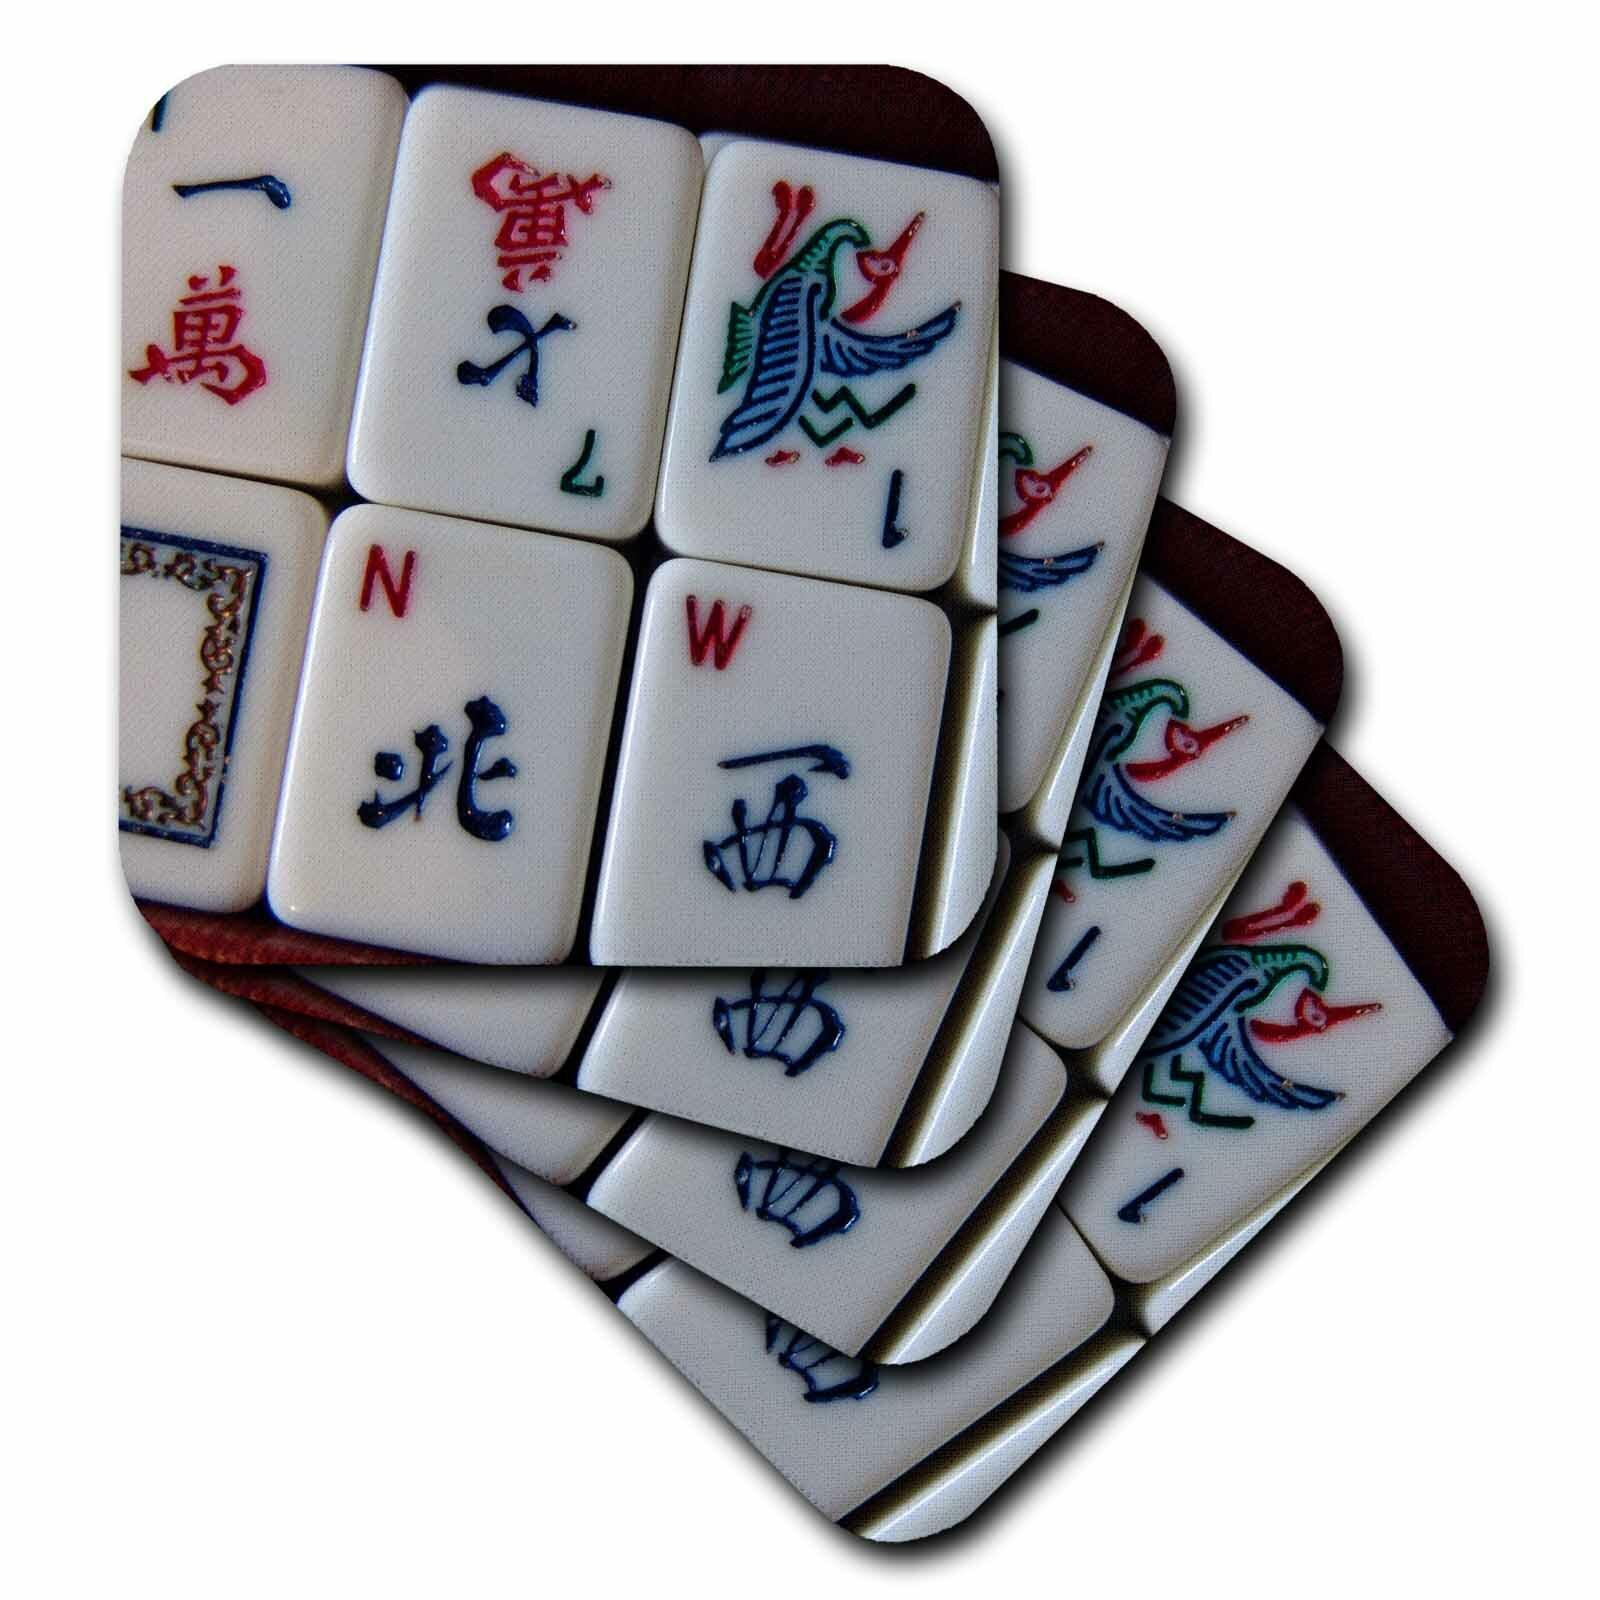 3drose Ceramic Tile Coasters Luv Mah Jongg Set Of 4 Cst 12772 3 Wayfair